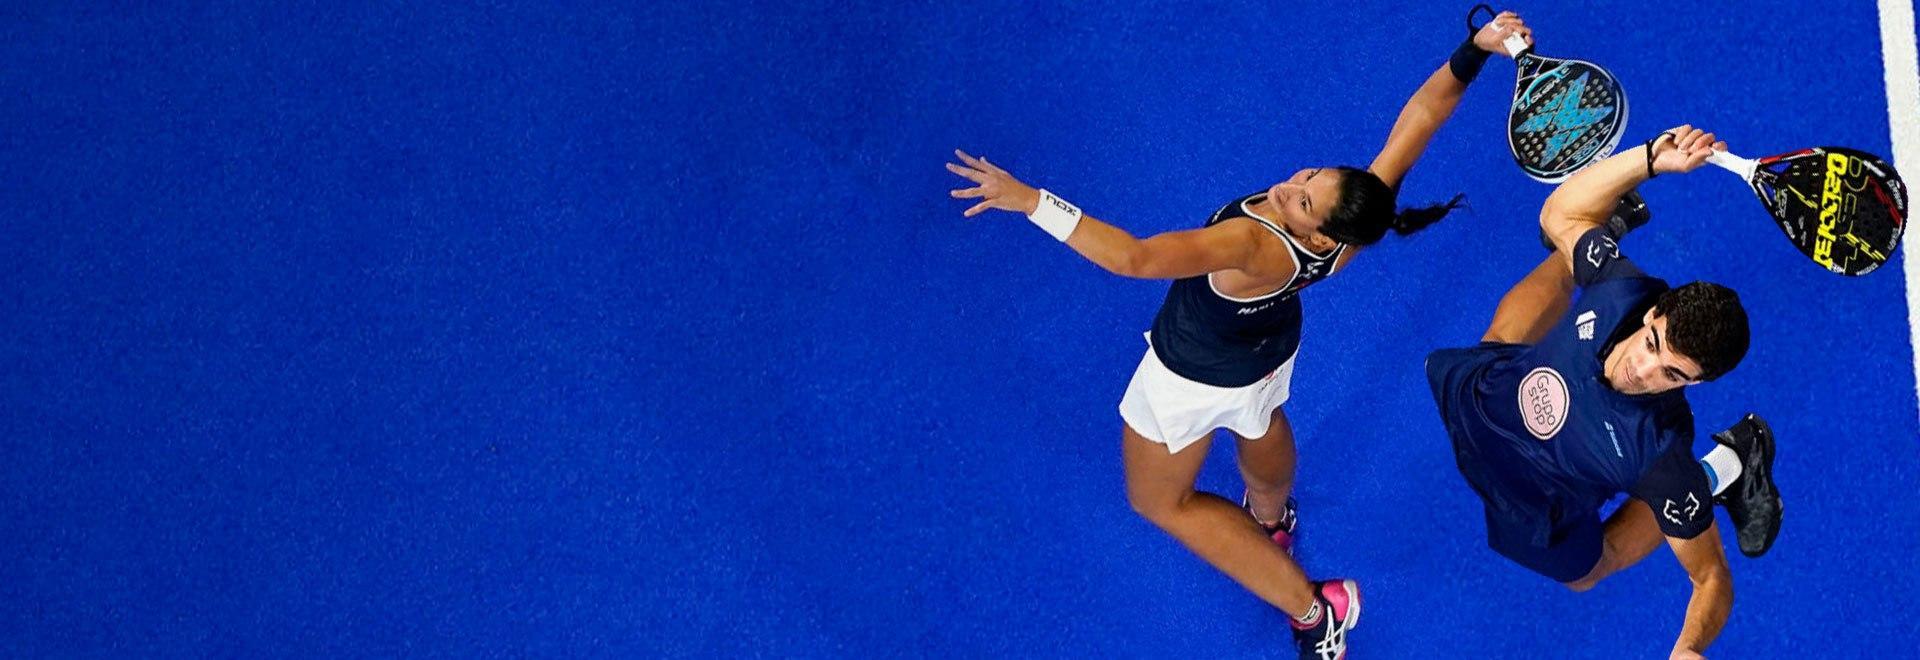 Lugo Open: Semifinali M/F Sessione diurna